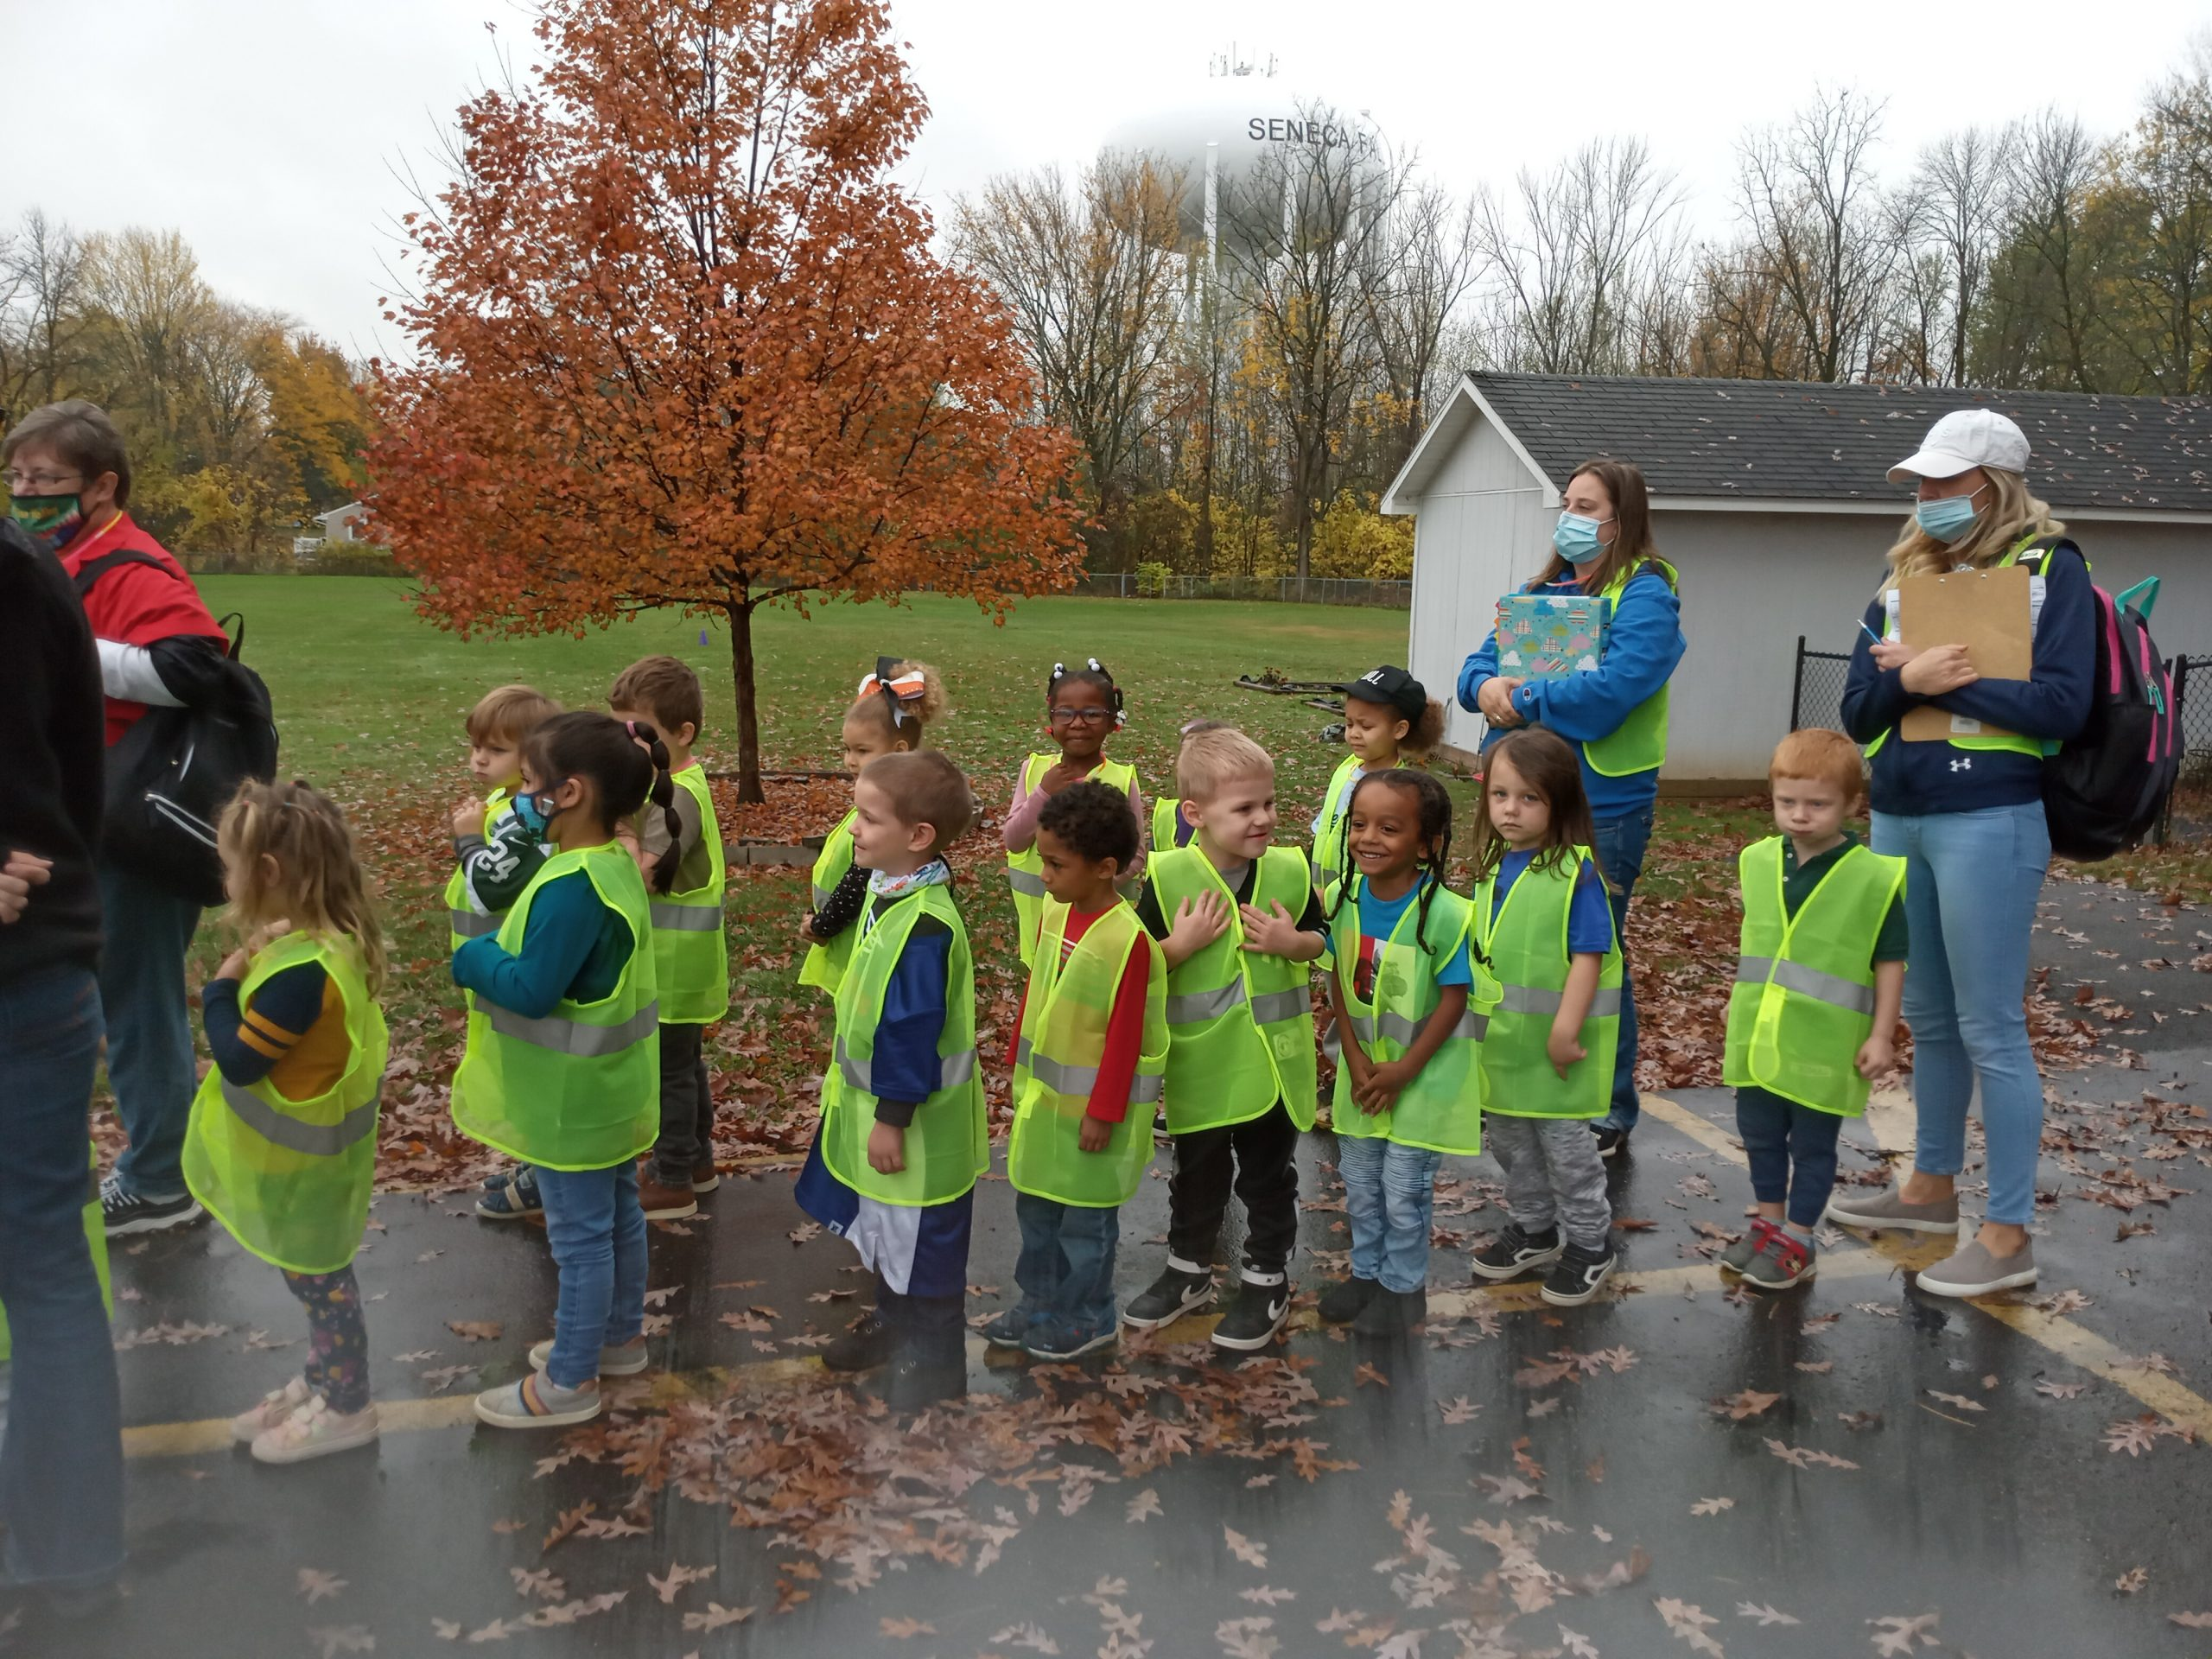 Seneca Meadows, Cintas partner on safety vest donation to Seneca County Head Start